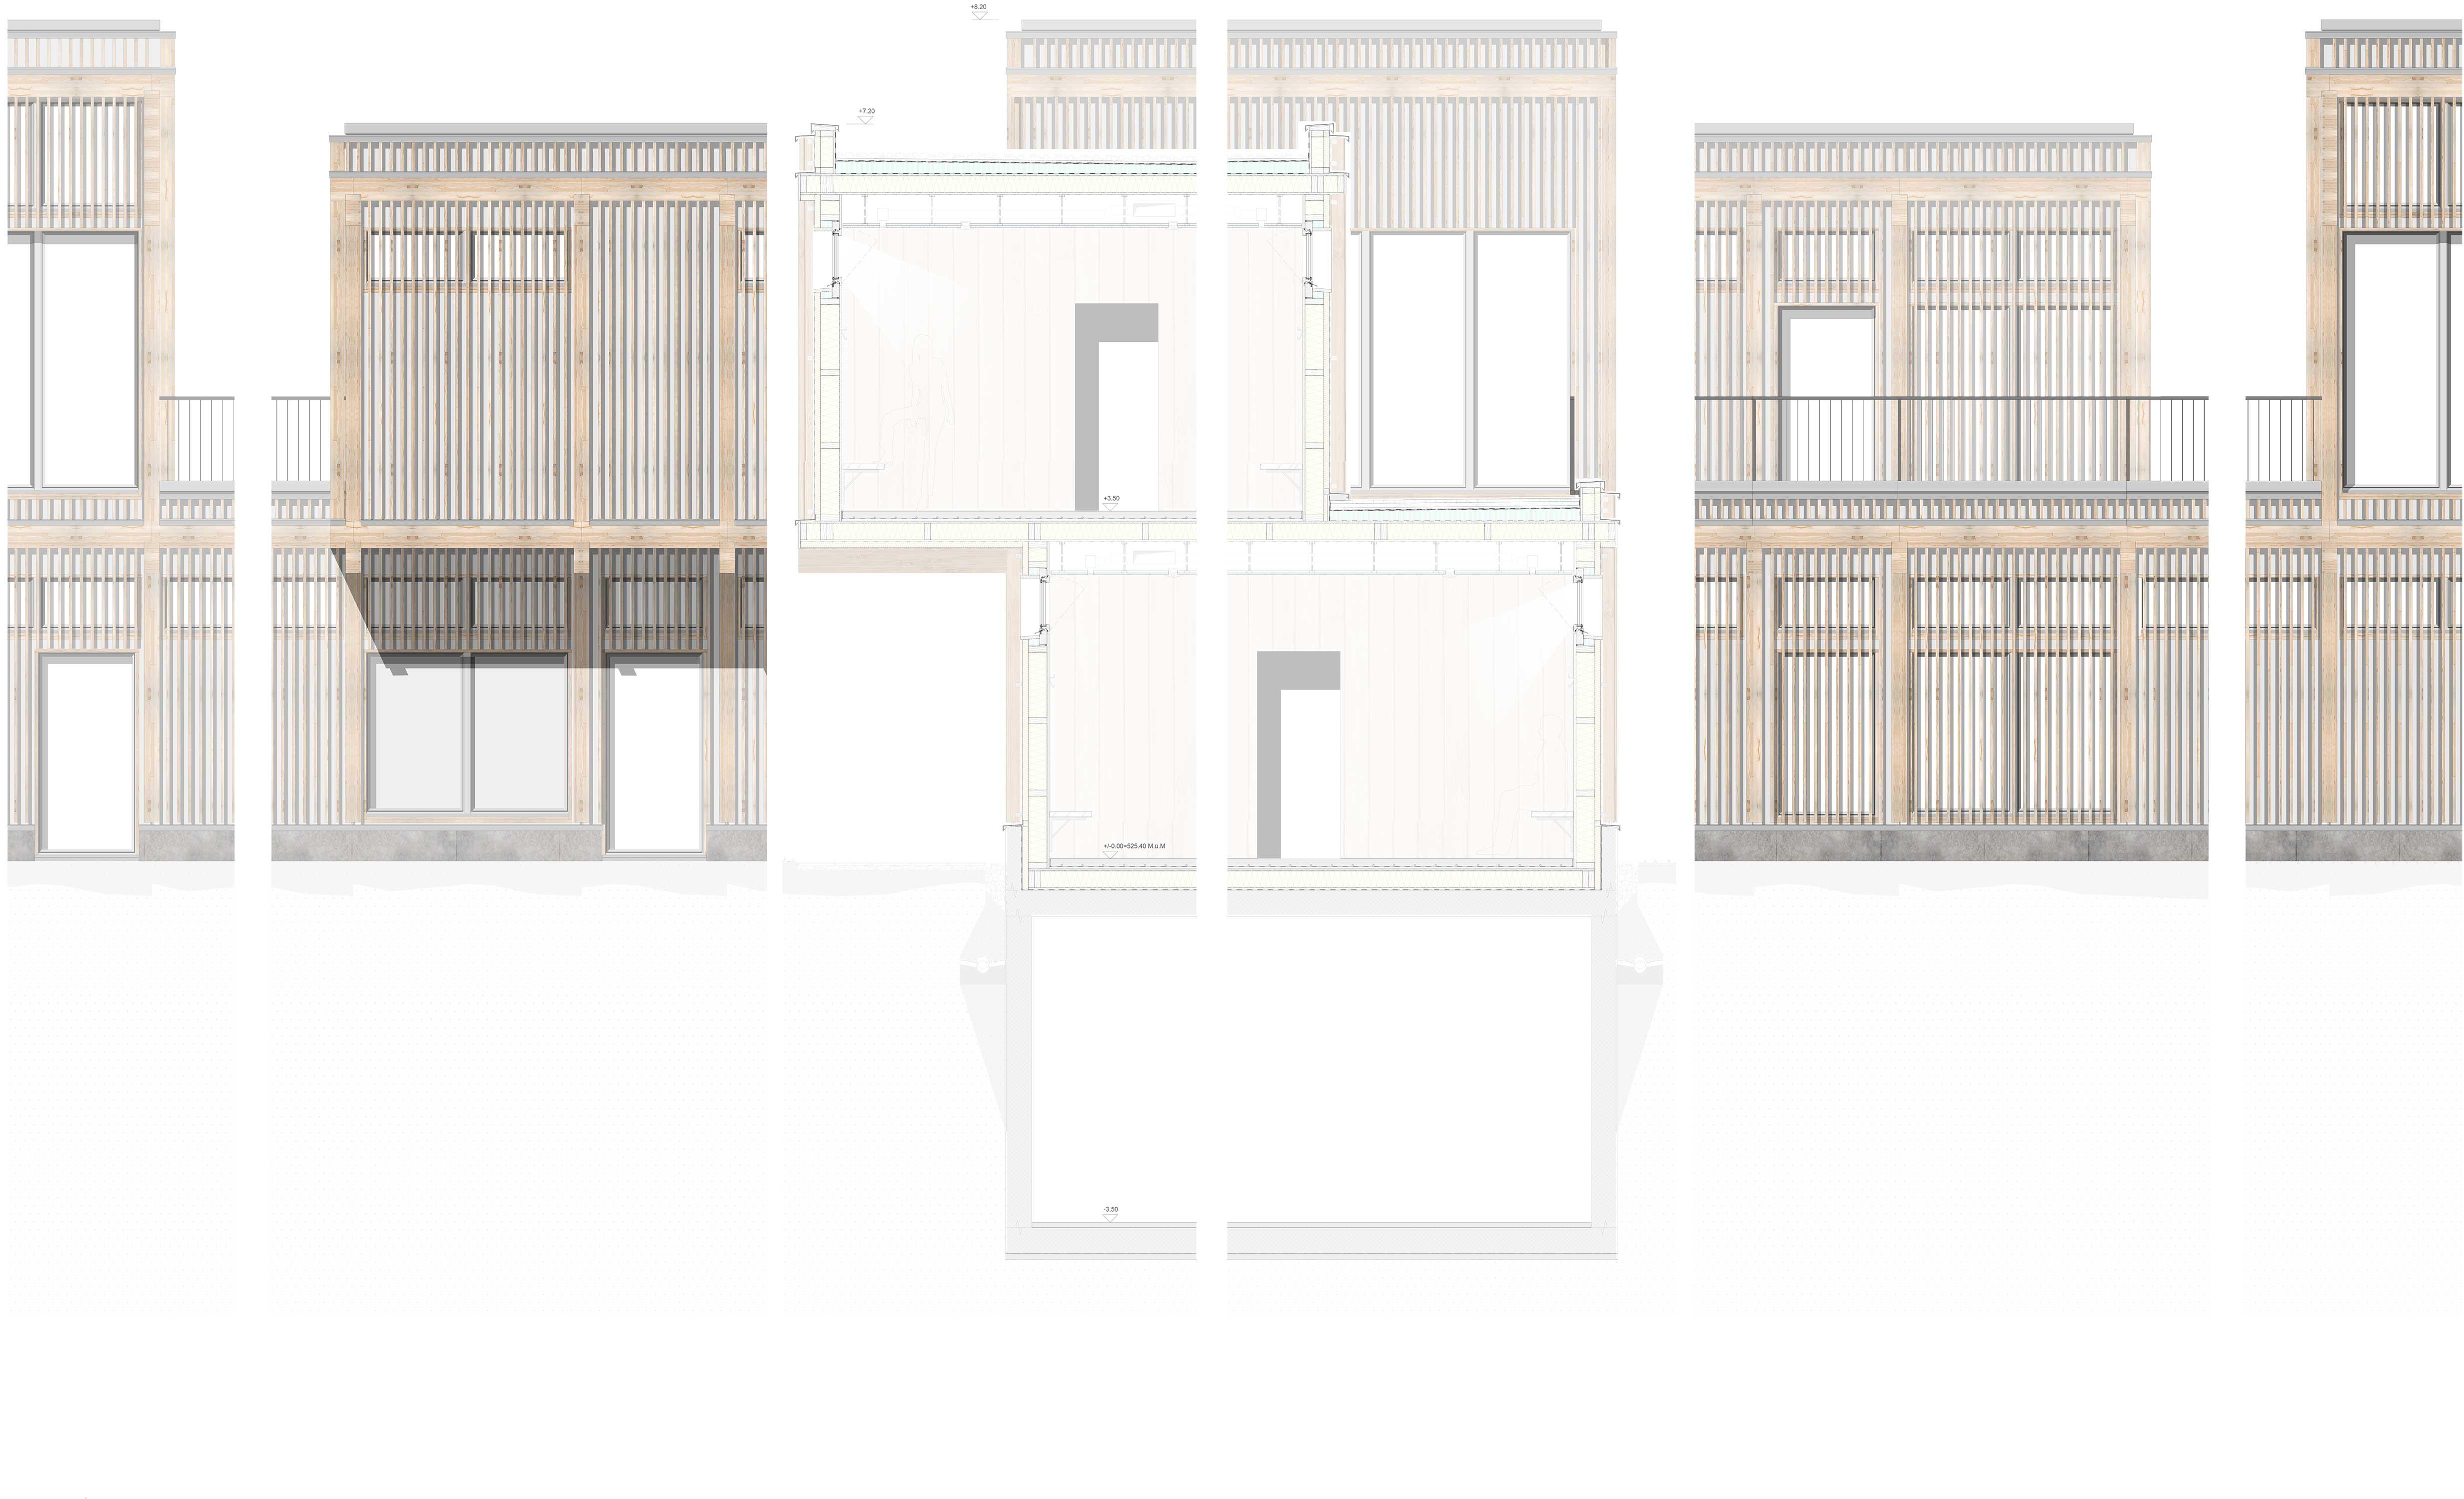 FassadenschnittWeb